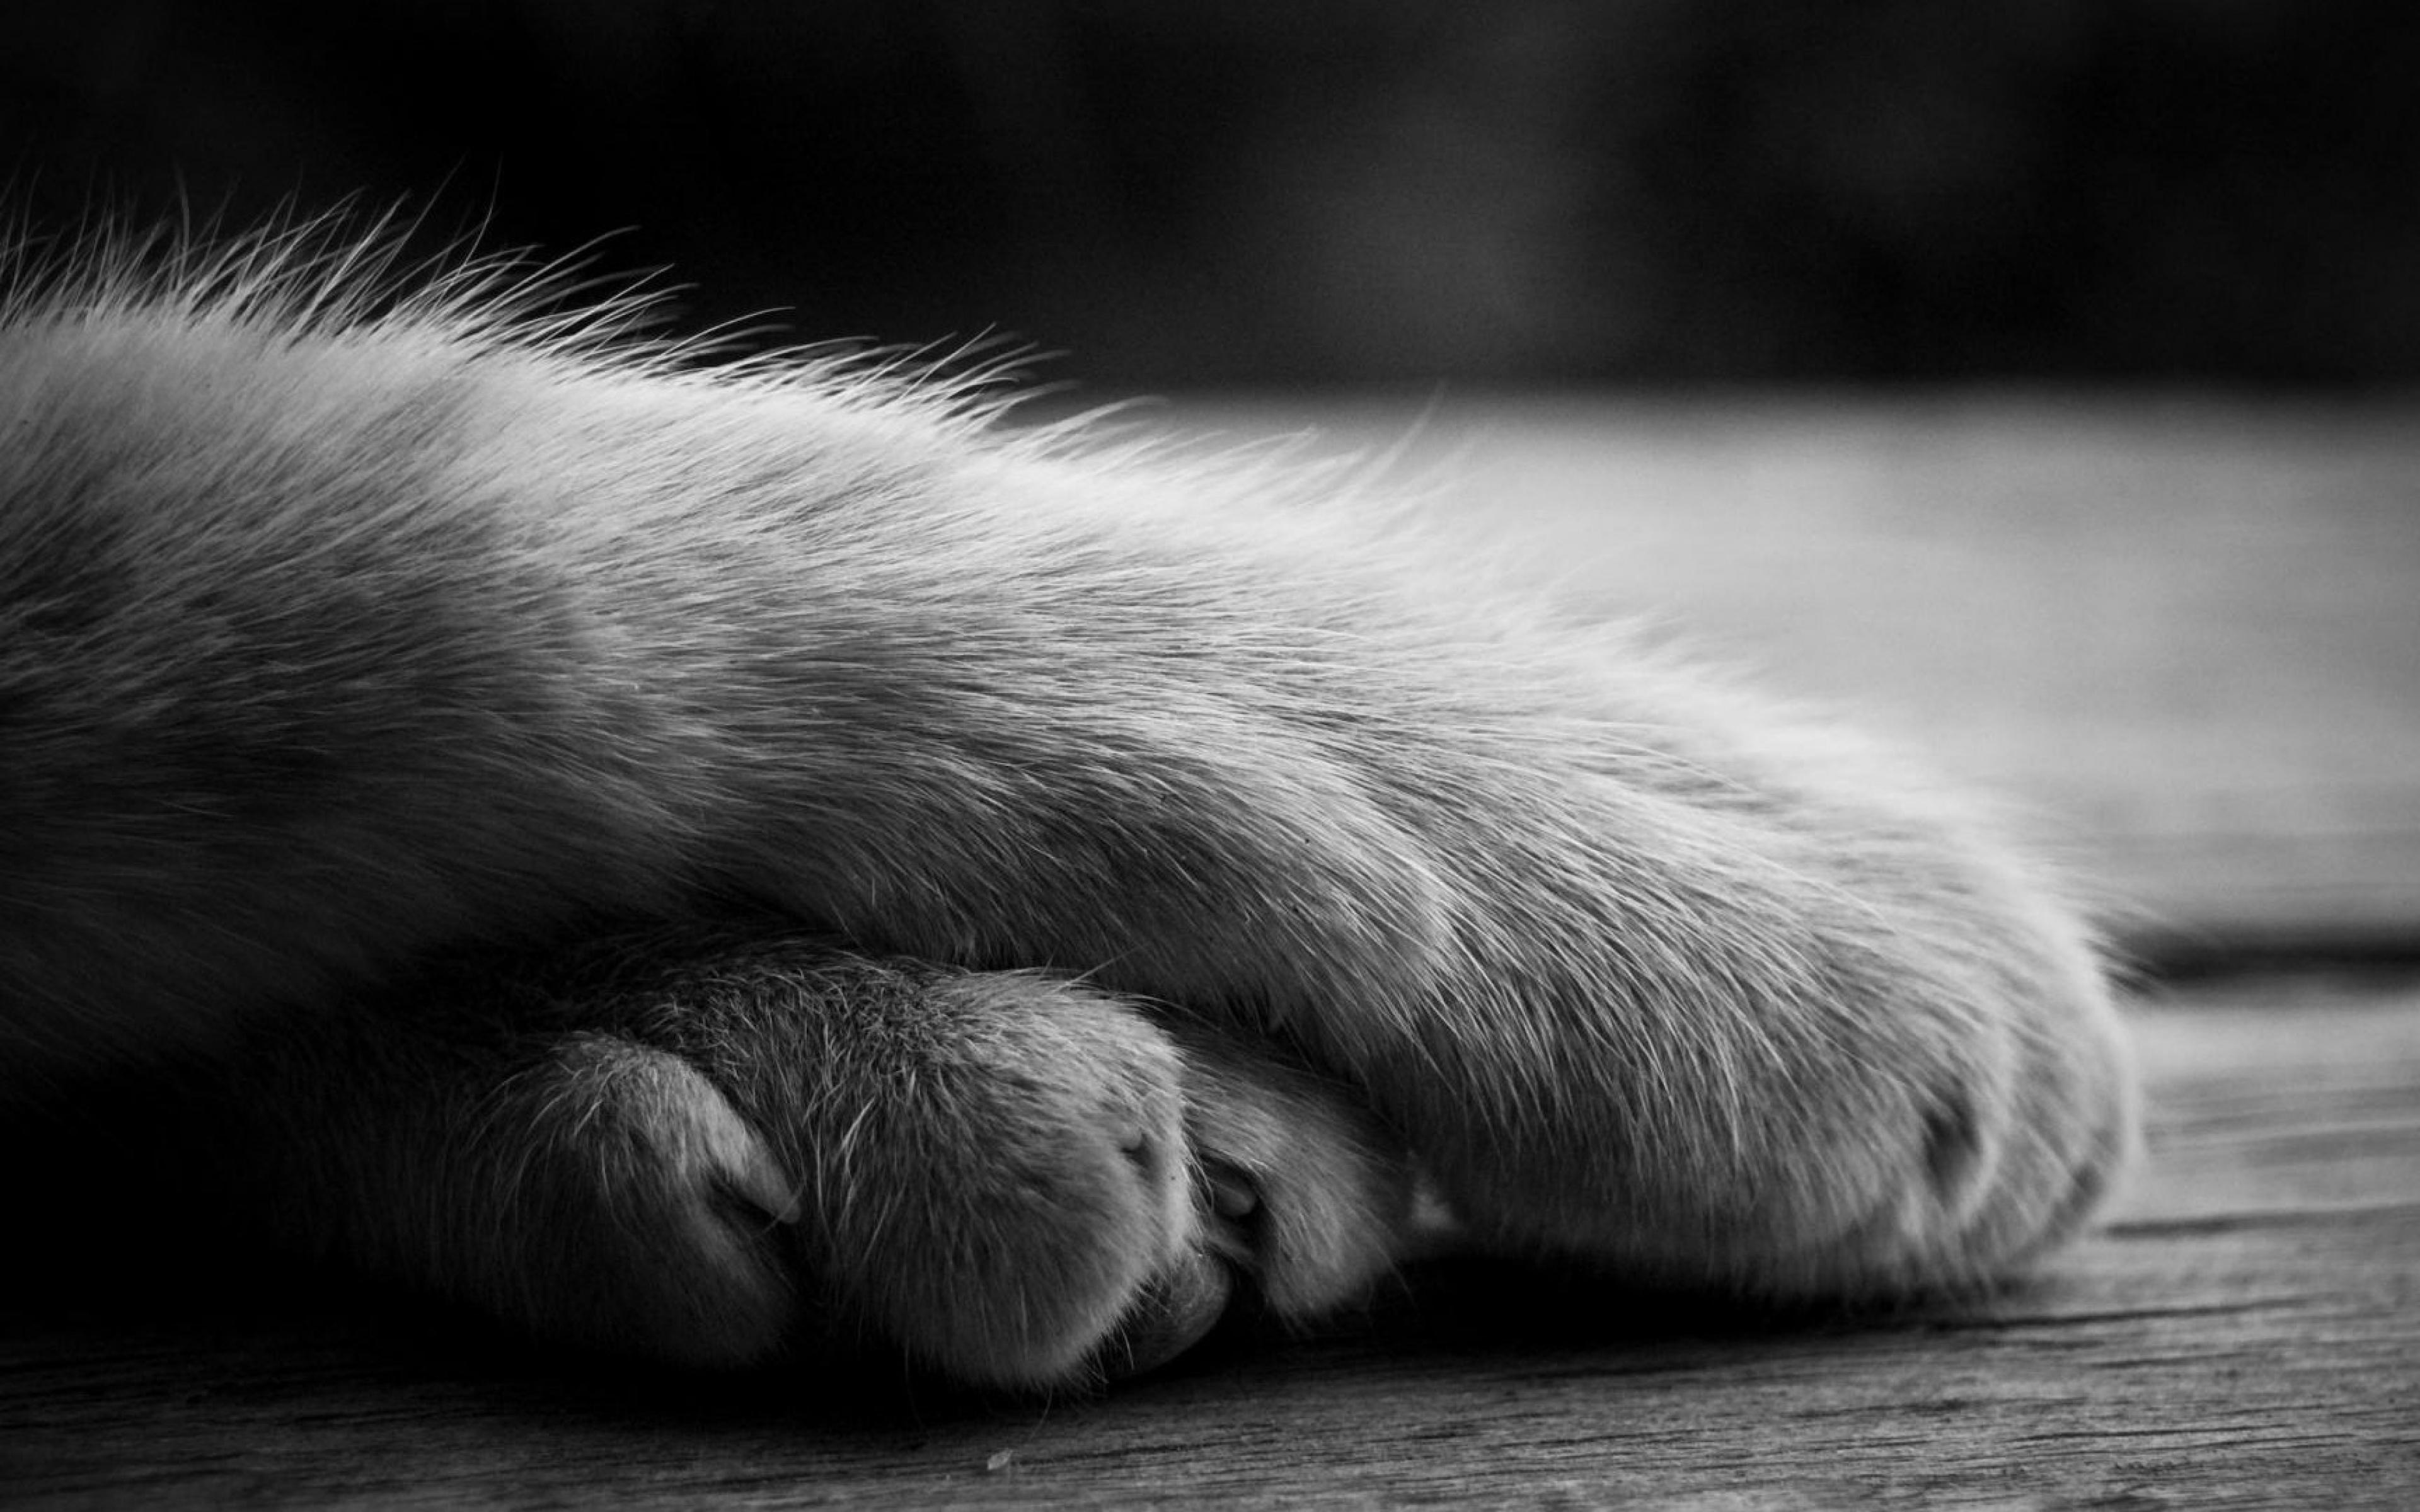 Free Download Wallpaper 3840x2400 Paws Cat Shadow Furry Black White Ultra Hd 4k 3840x2400 For Your Desktop Mobile Tablet Explore 49 4k Furry Wallpaper 3840x2160 Wallpaper 4k Hd Wallpaper